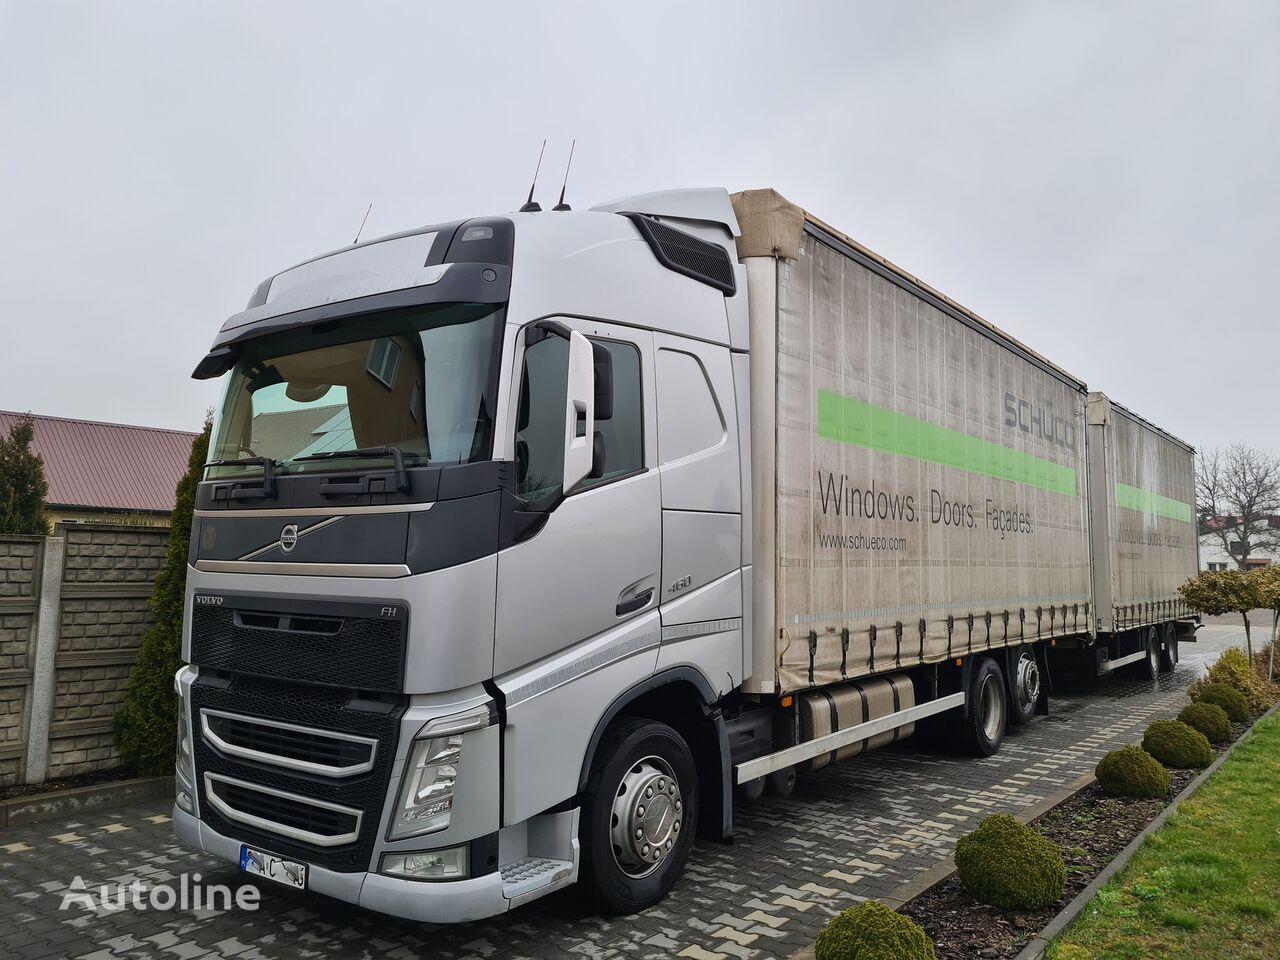 VOLVO FH4 460 EURO 5 ZESTAW TANDEM WIELTON tilt truck + tilt trailer